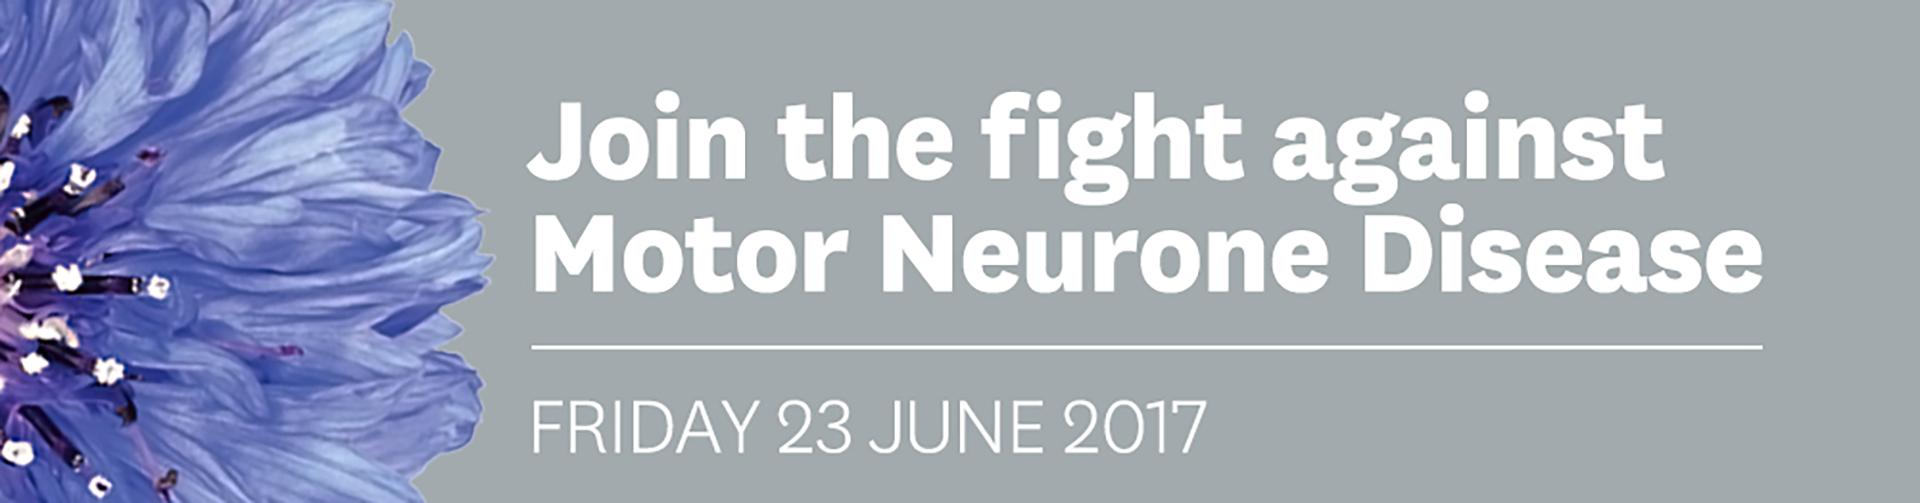 Motor neurone disease fundraiser this week at macquarie for Motor neurone disease support